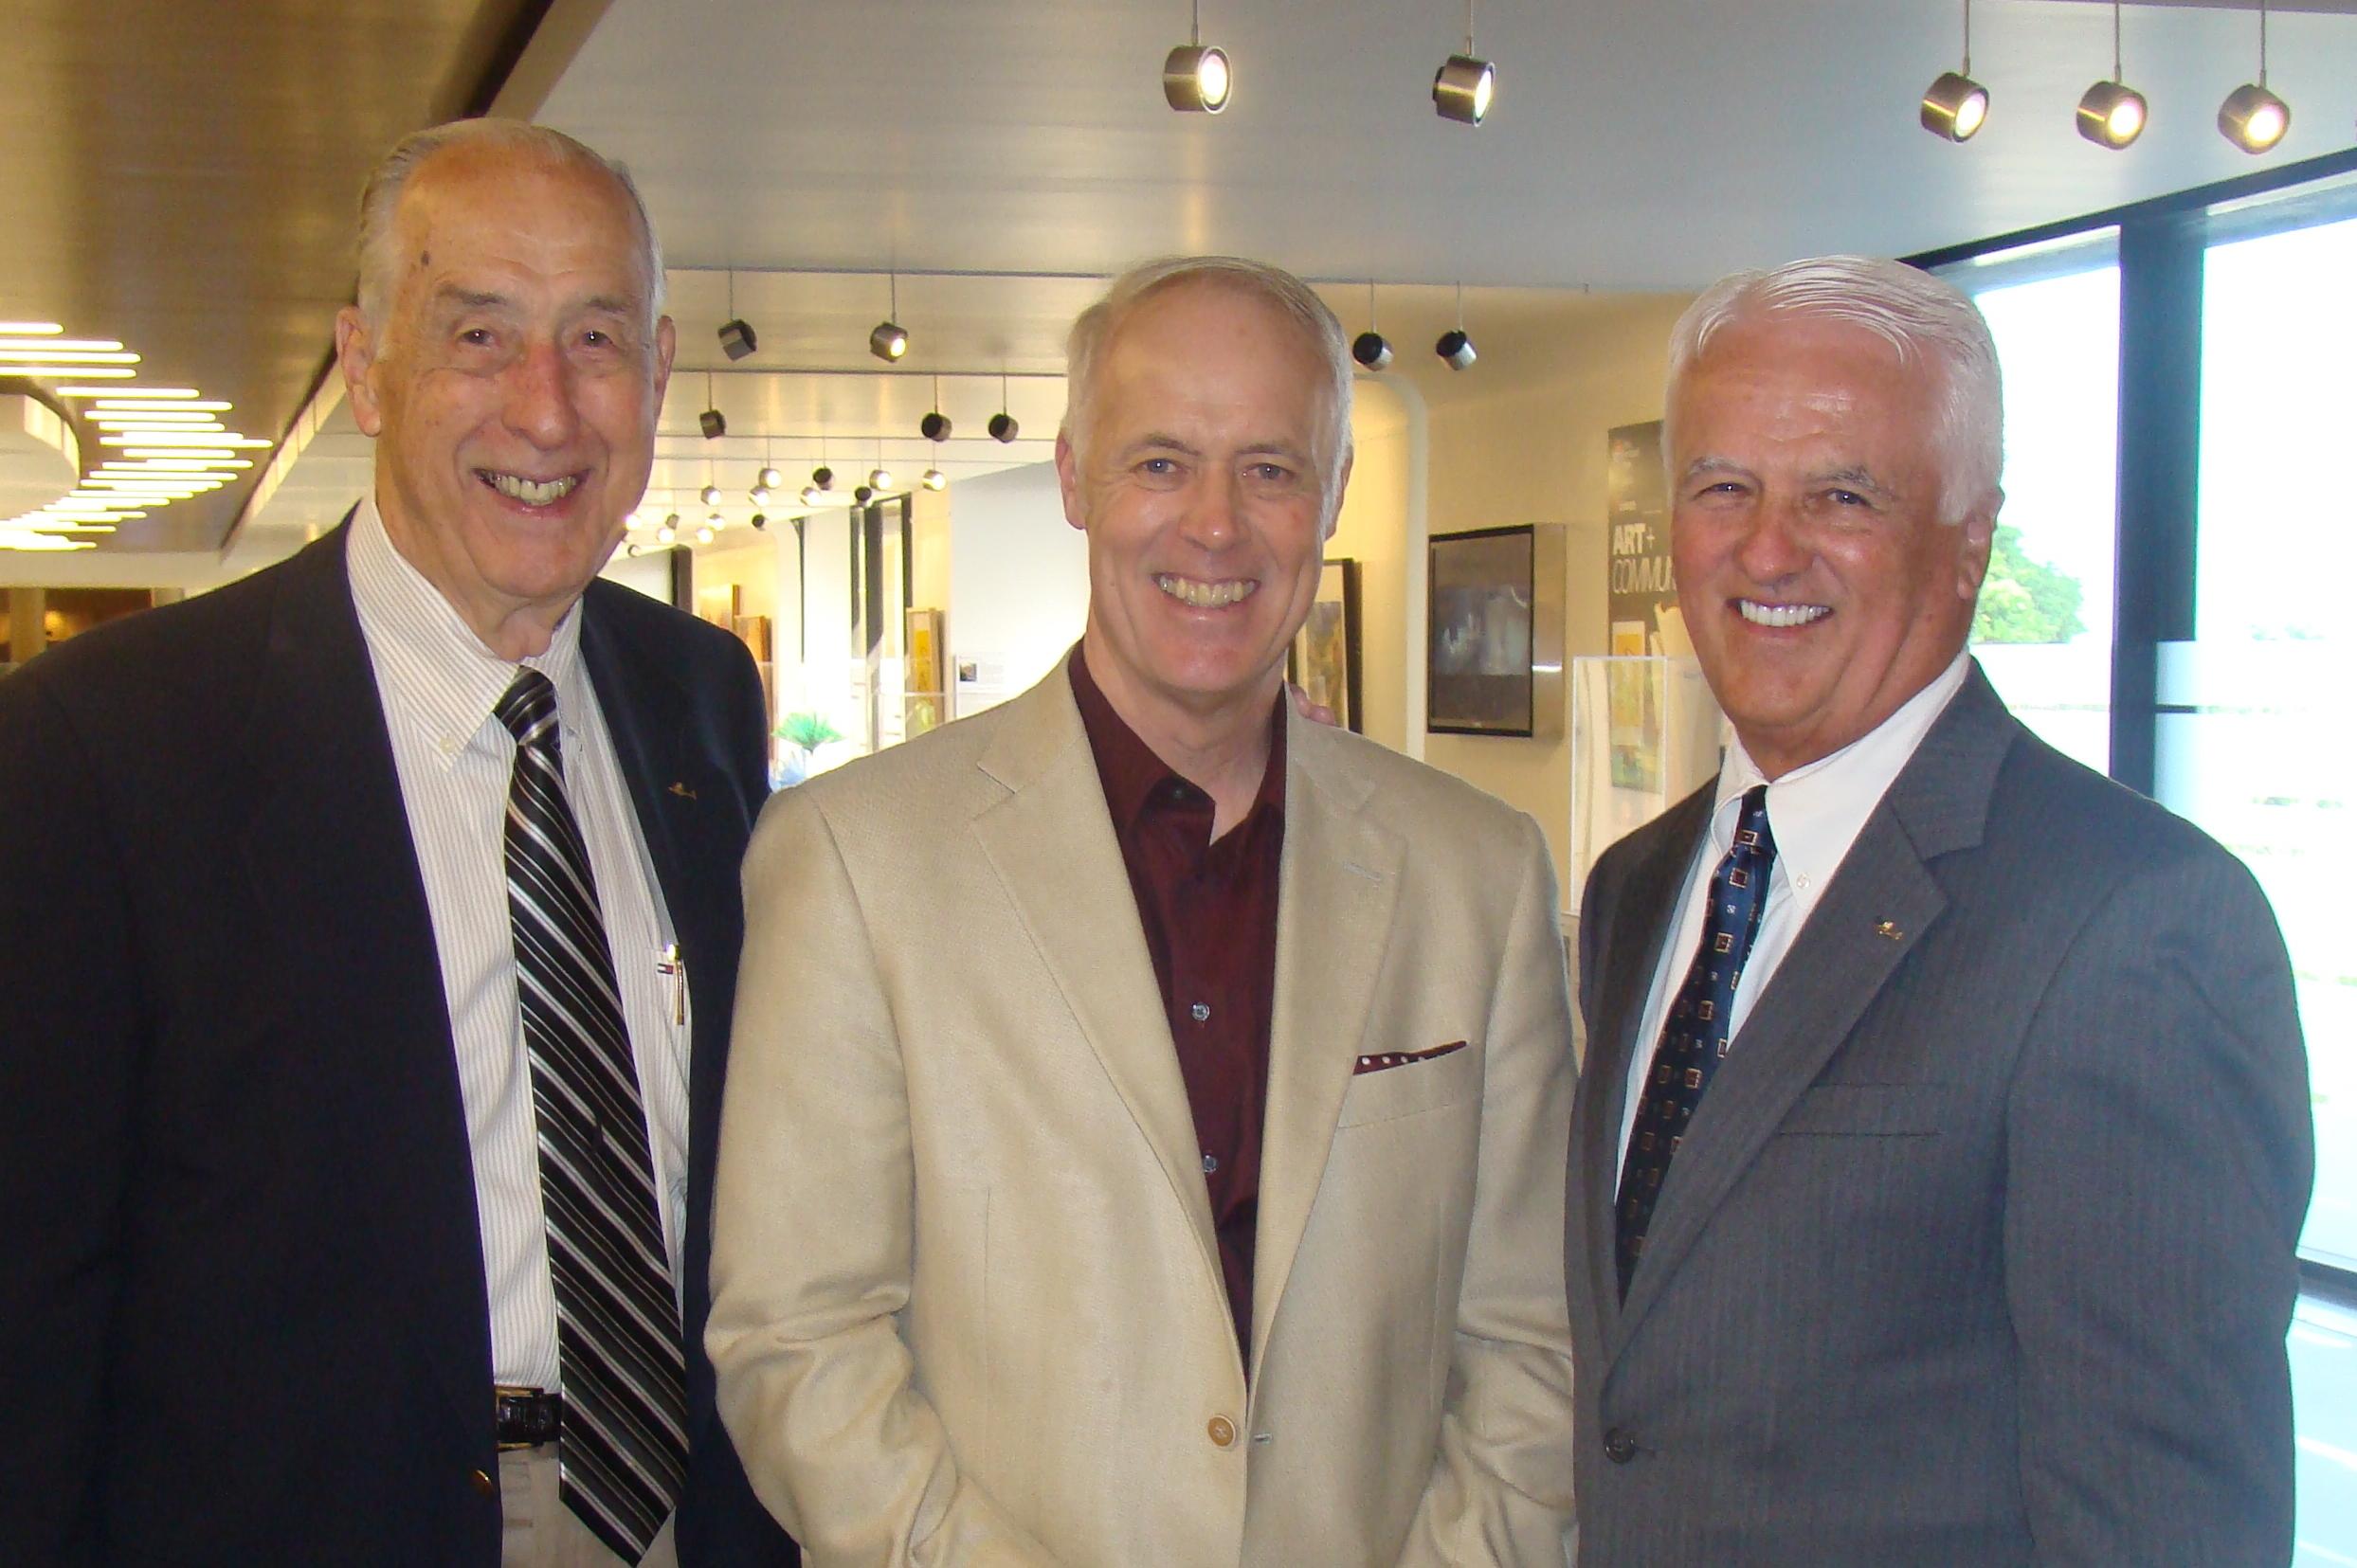 Me, Dick & John O'Connnor - 1, 30 Oct '14.JPG